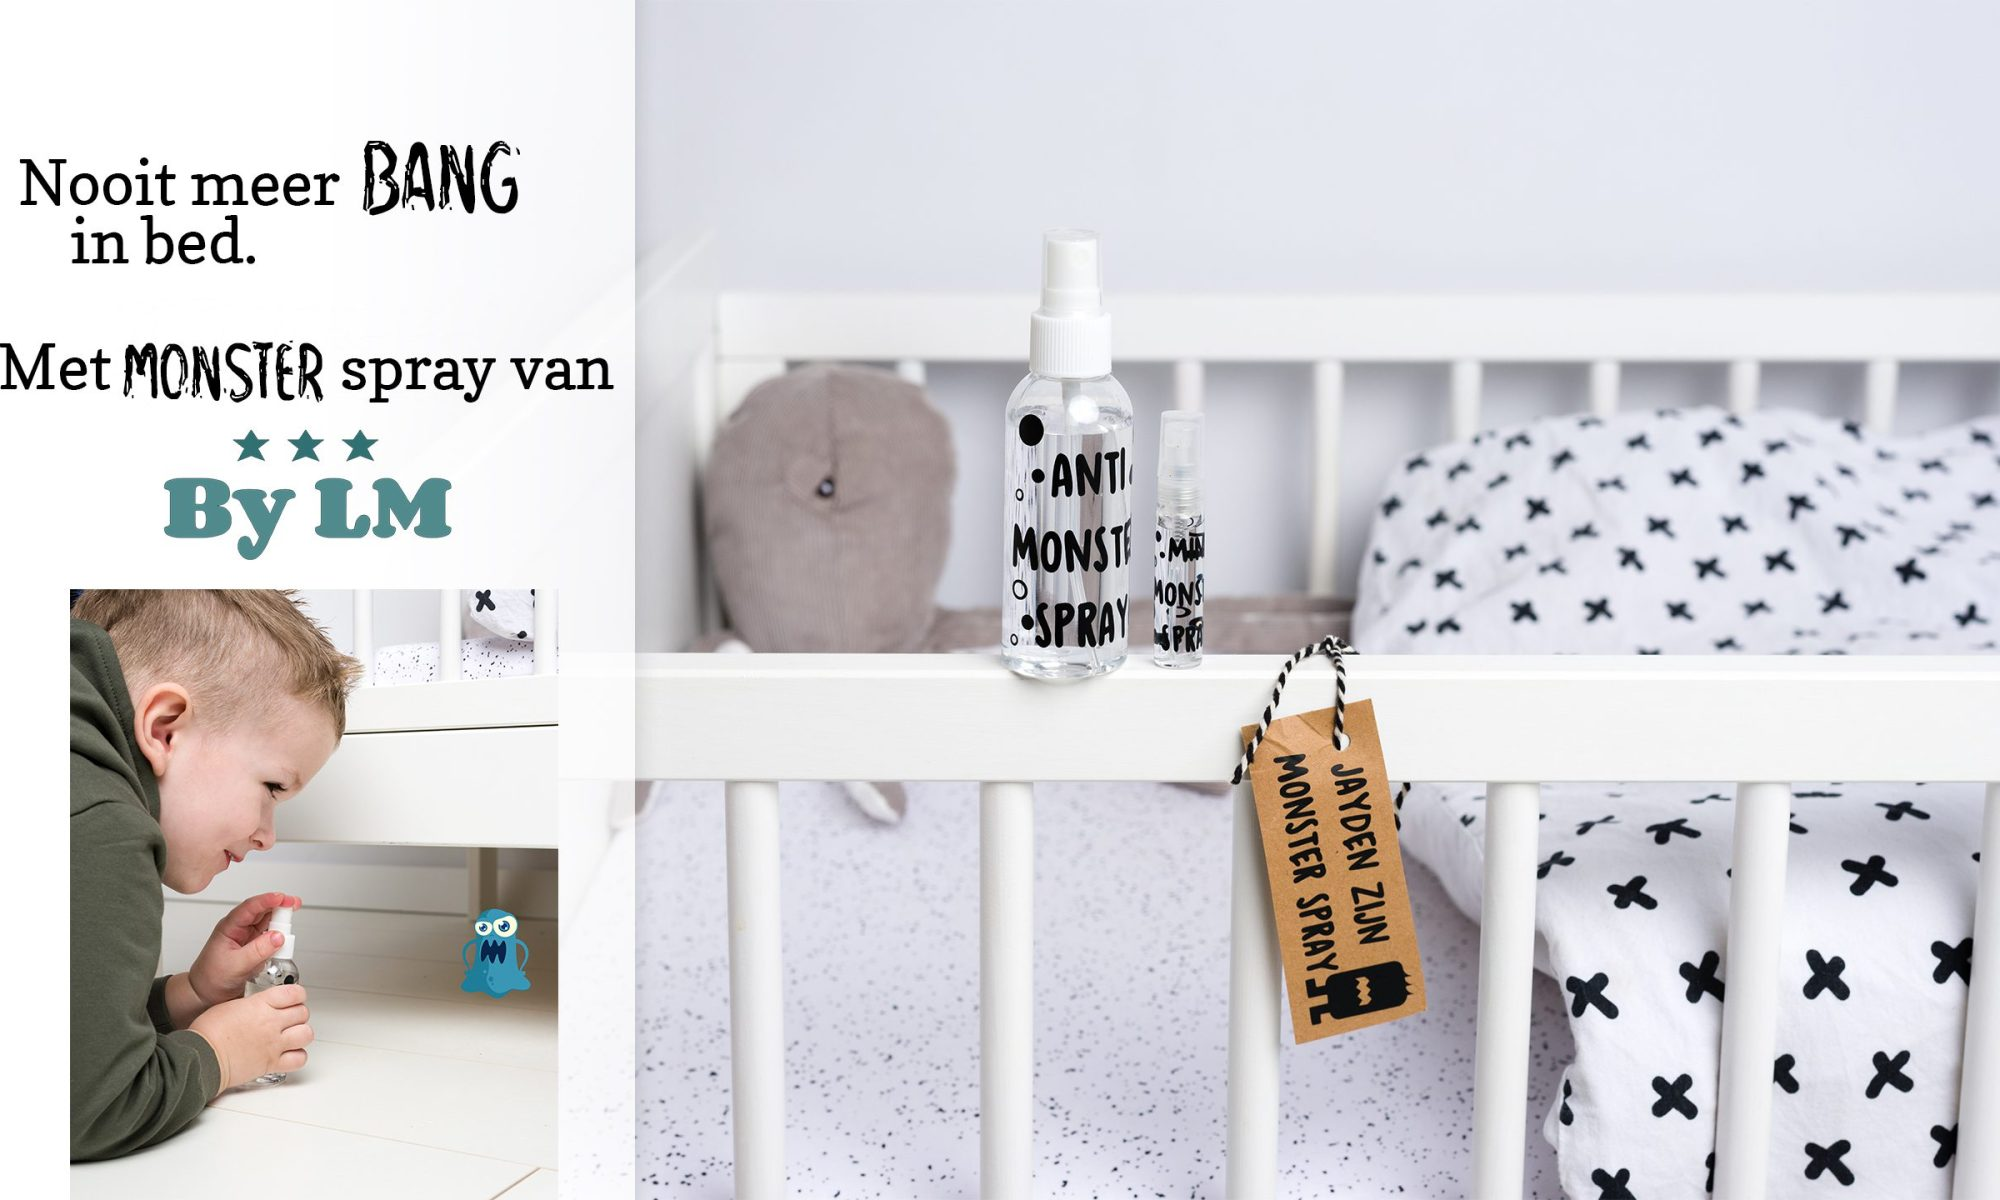 Monsterspray peuter monsters bang donker bed mama blog by LM bylm www.liefkleinwonder.nl